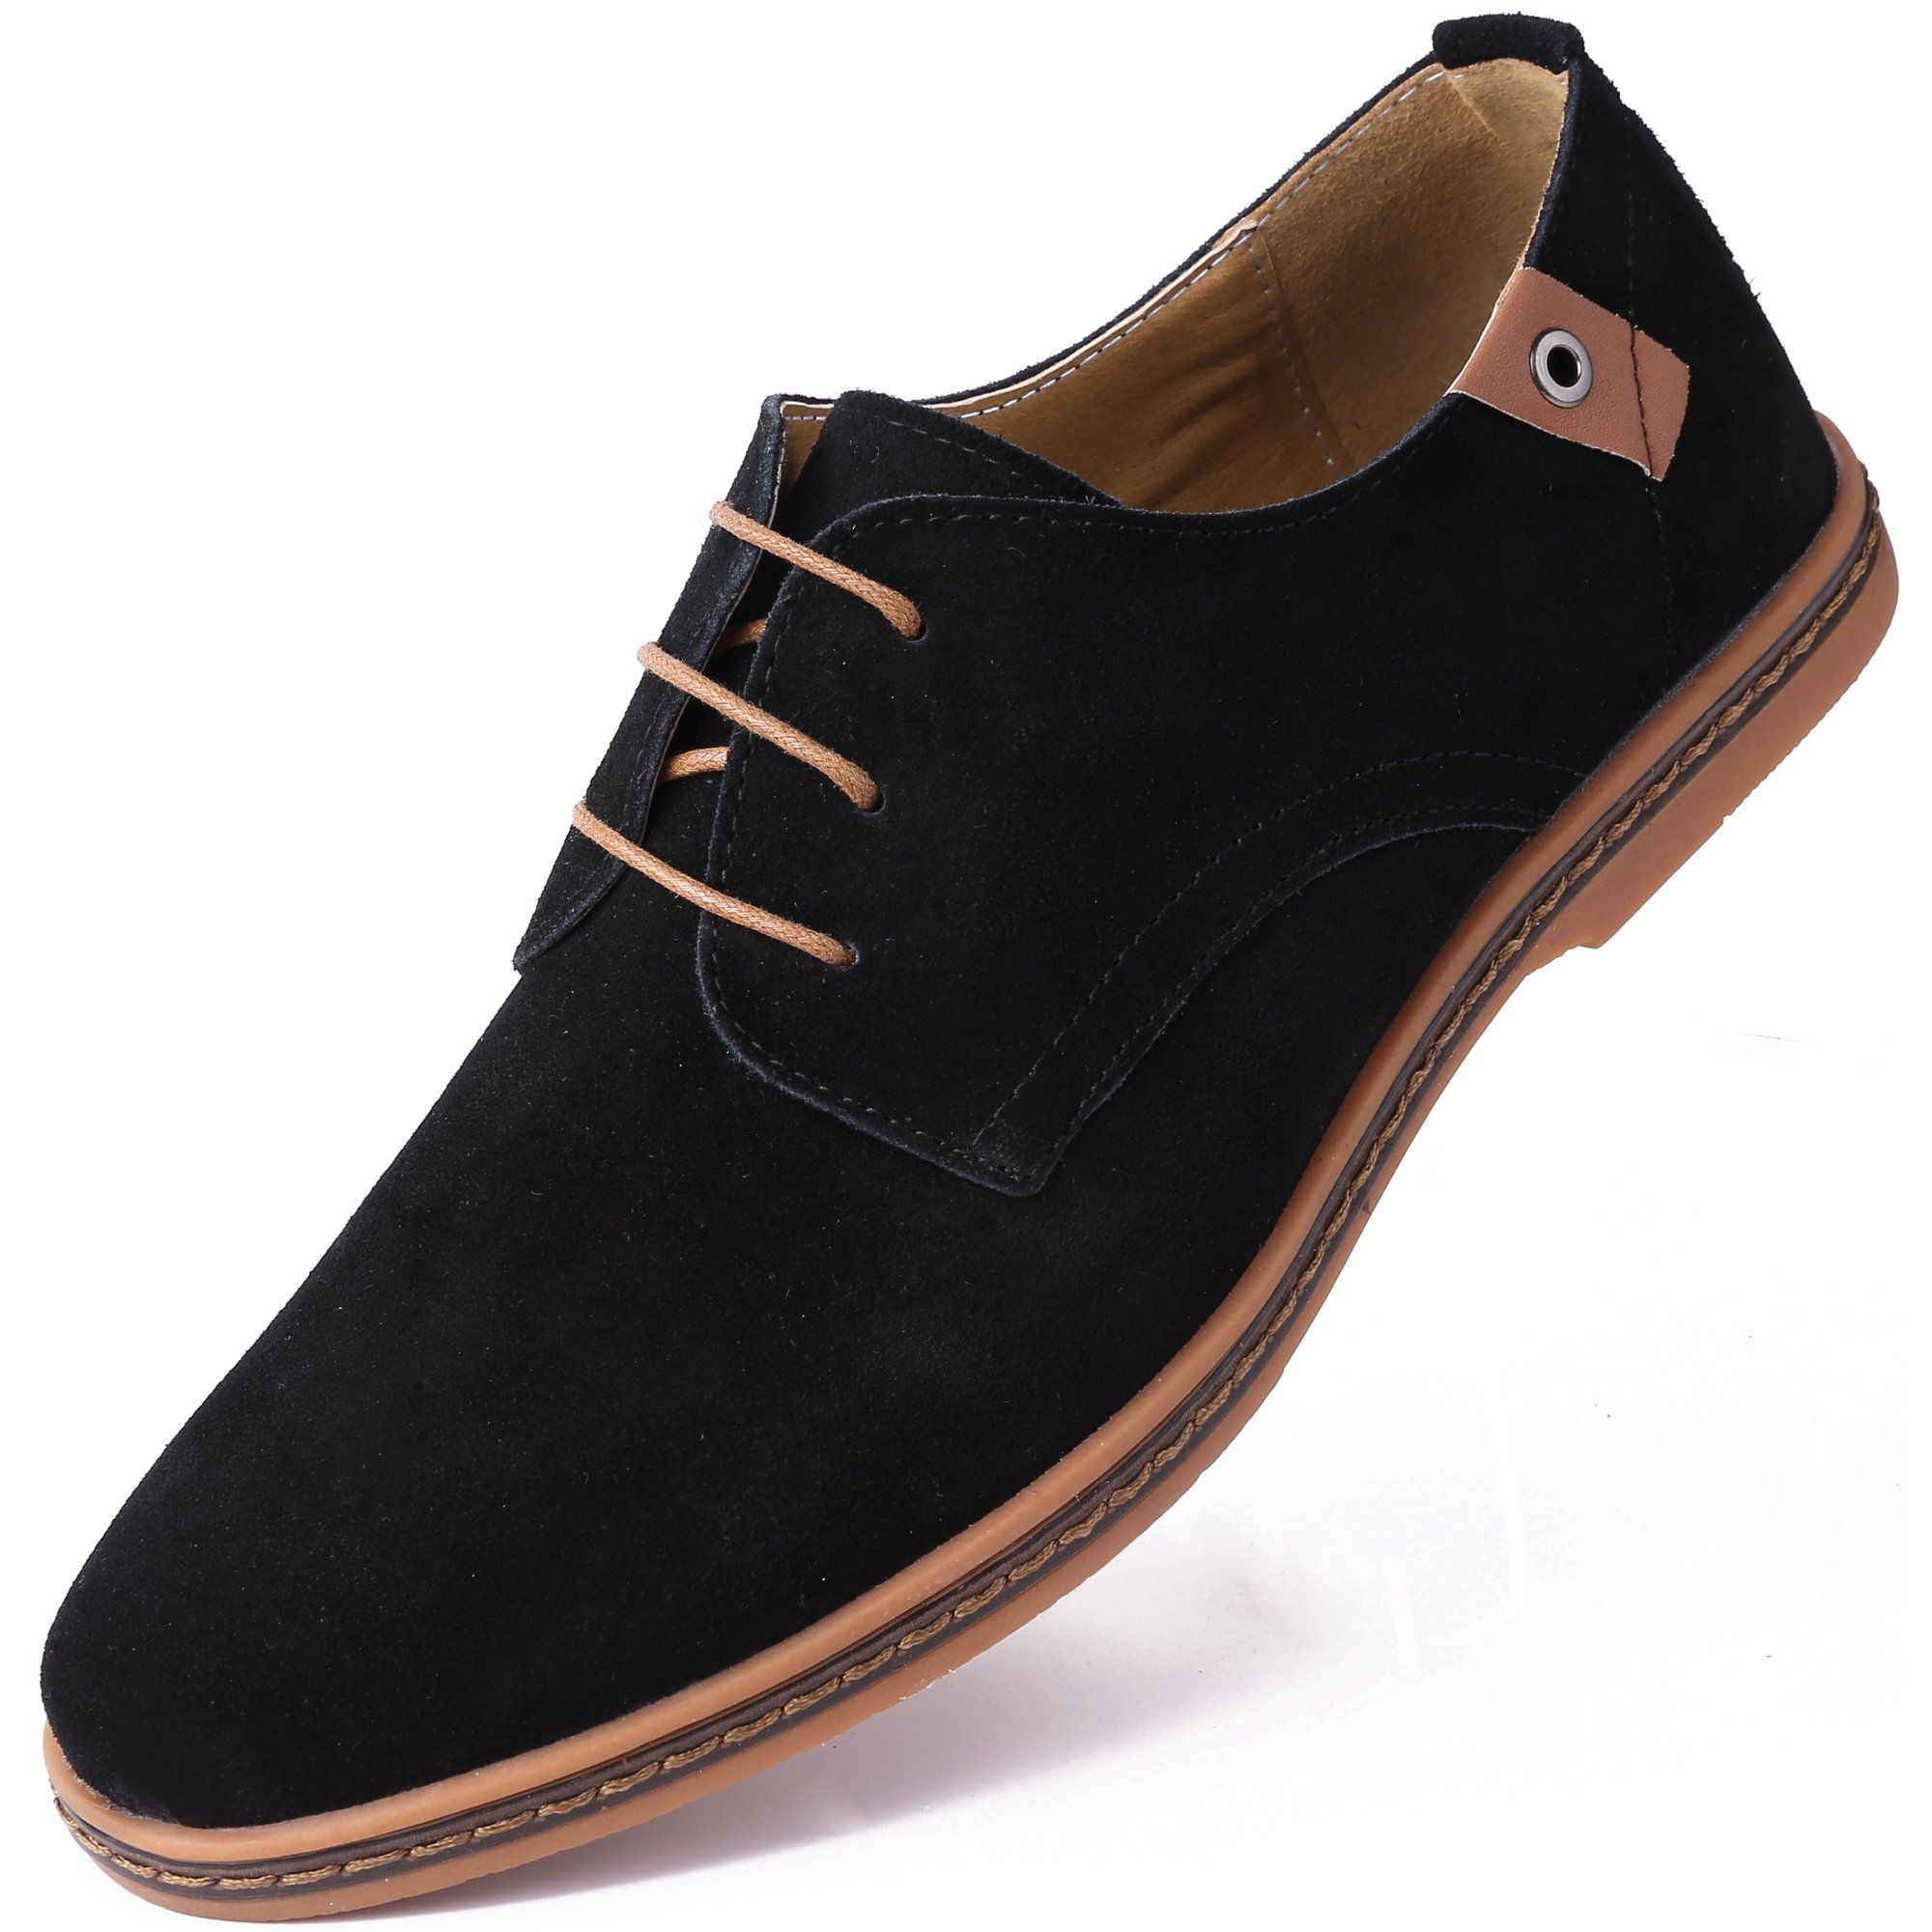 Mio Marino Mio Marino Men S Suede Derby Casual Dress Shoes Walmart Com In 2021 Dress Shoes Men Business Casual Shoes Mens Casual Shoes [ 2000 x 2000 Pixel ]